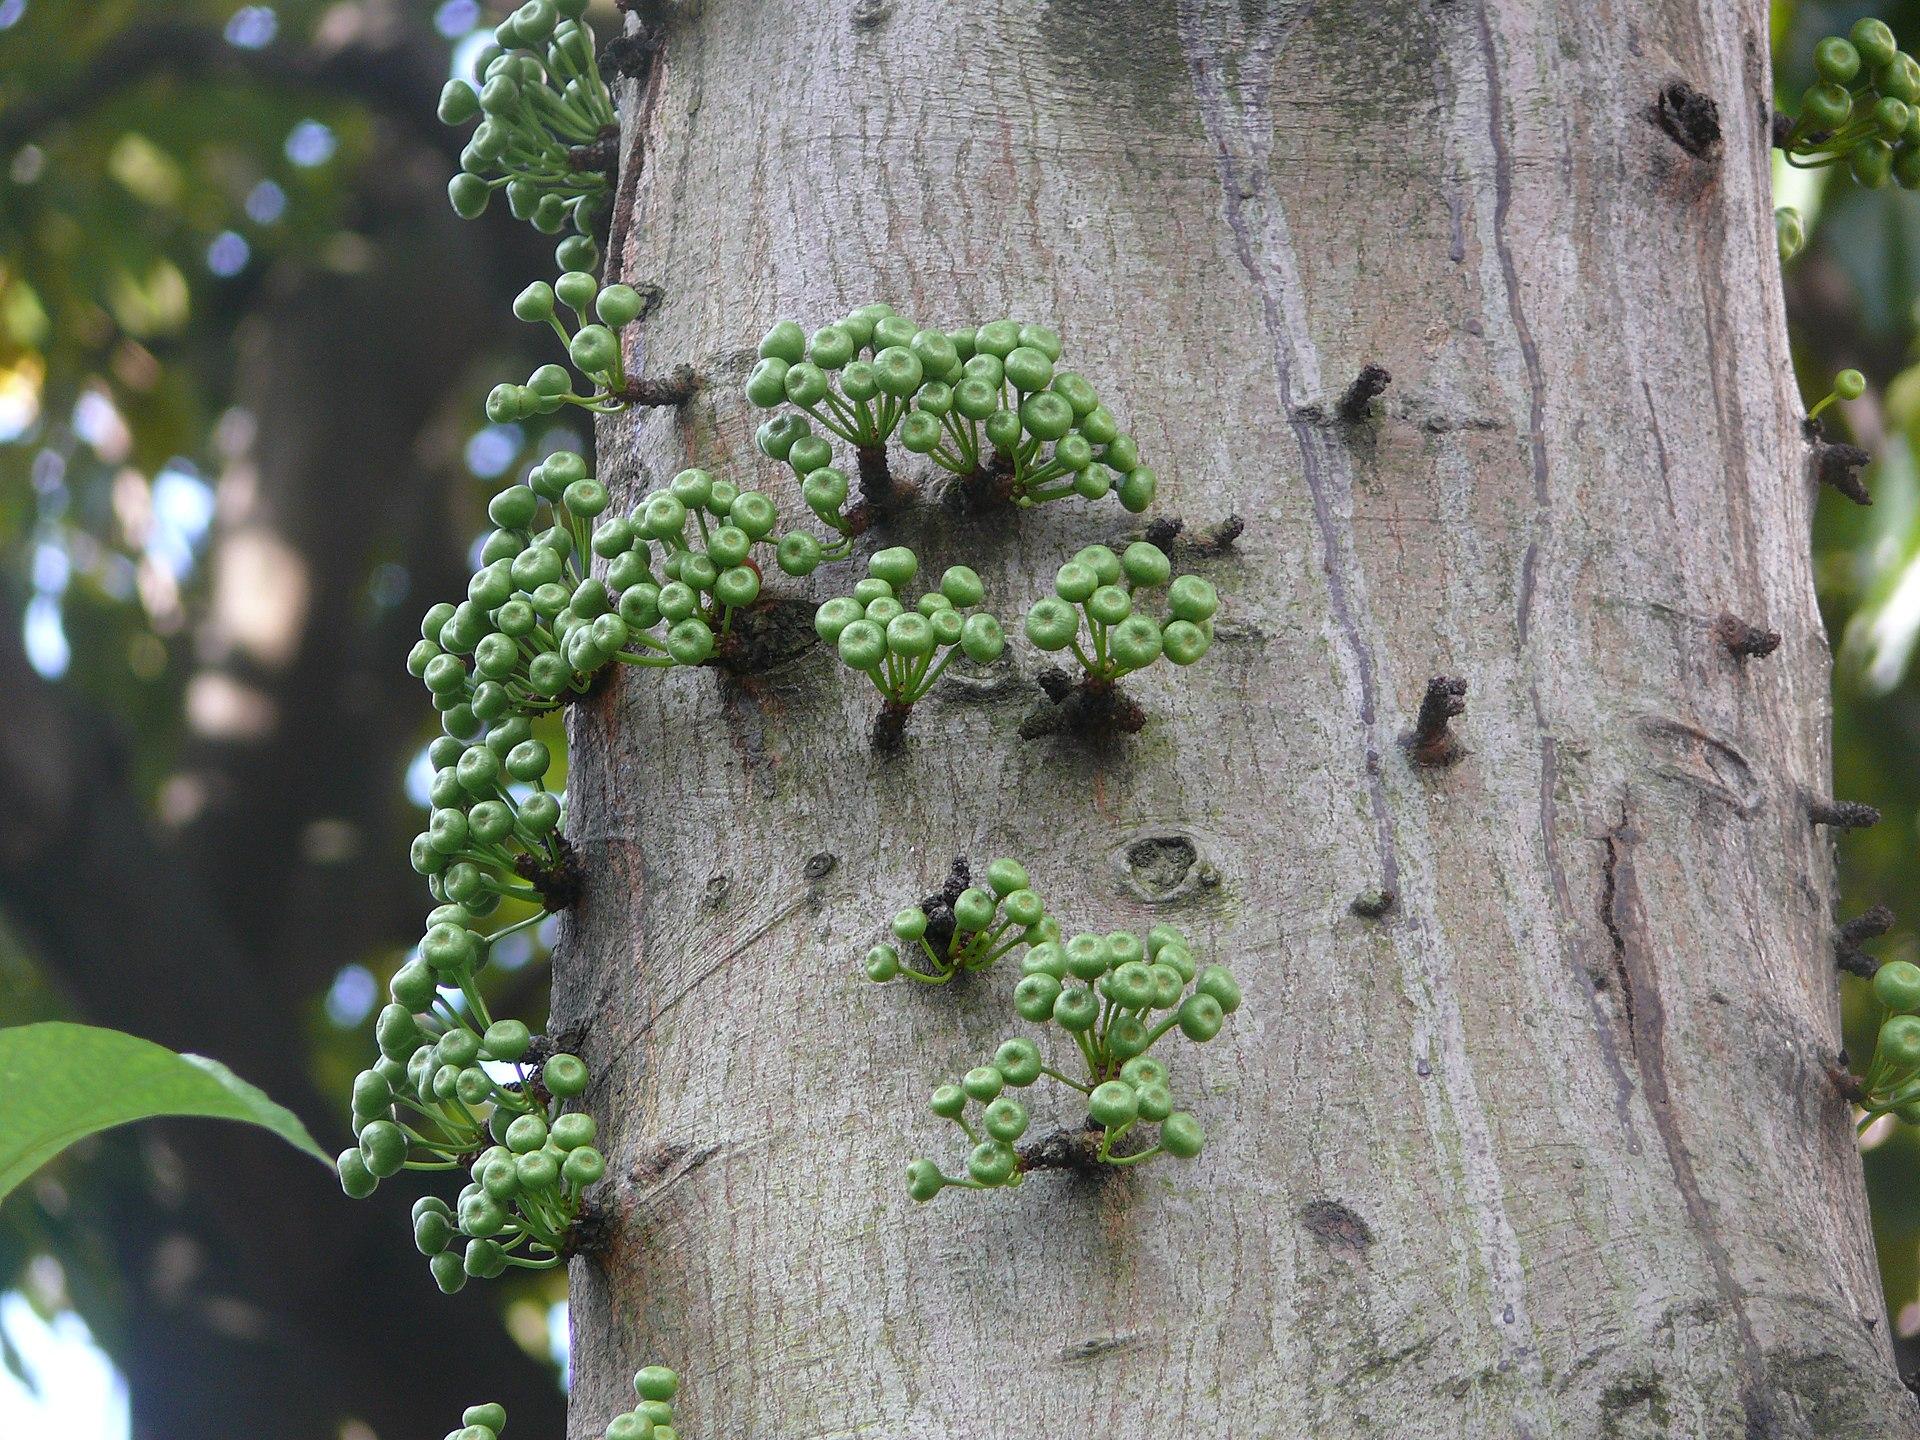 Garden Bush: Ficus Variegata (plant)